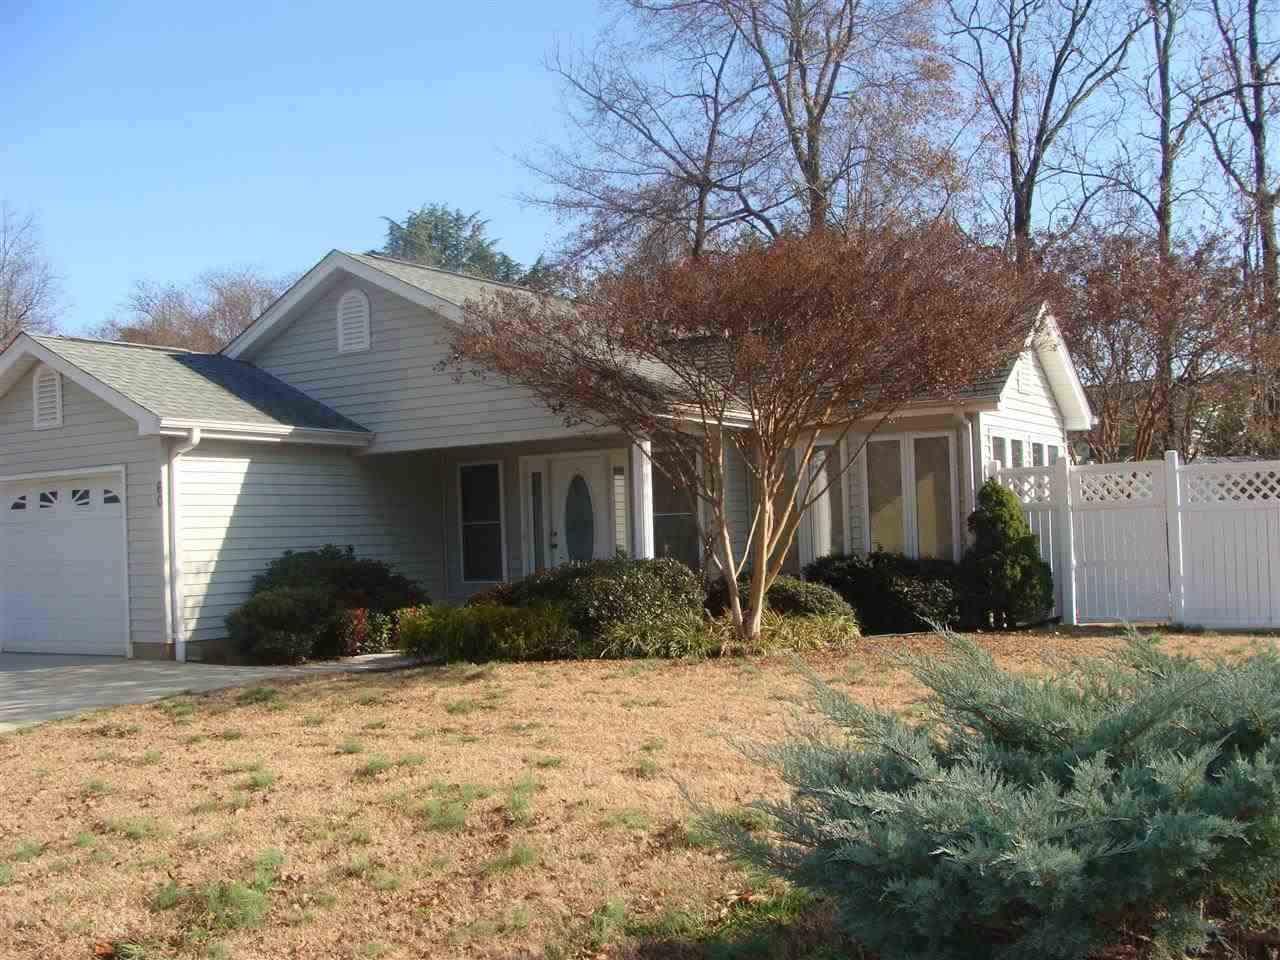 Rental Homes for Rent, ListingId:32729344, location: 60 Thompson Ave. Walhalla 29691